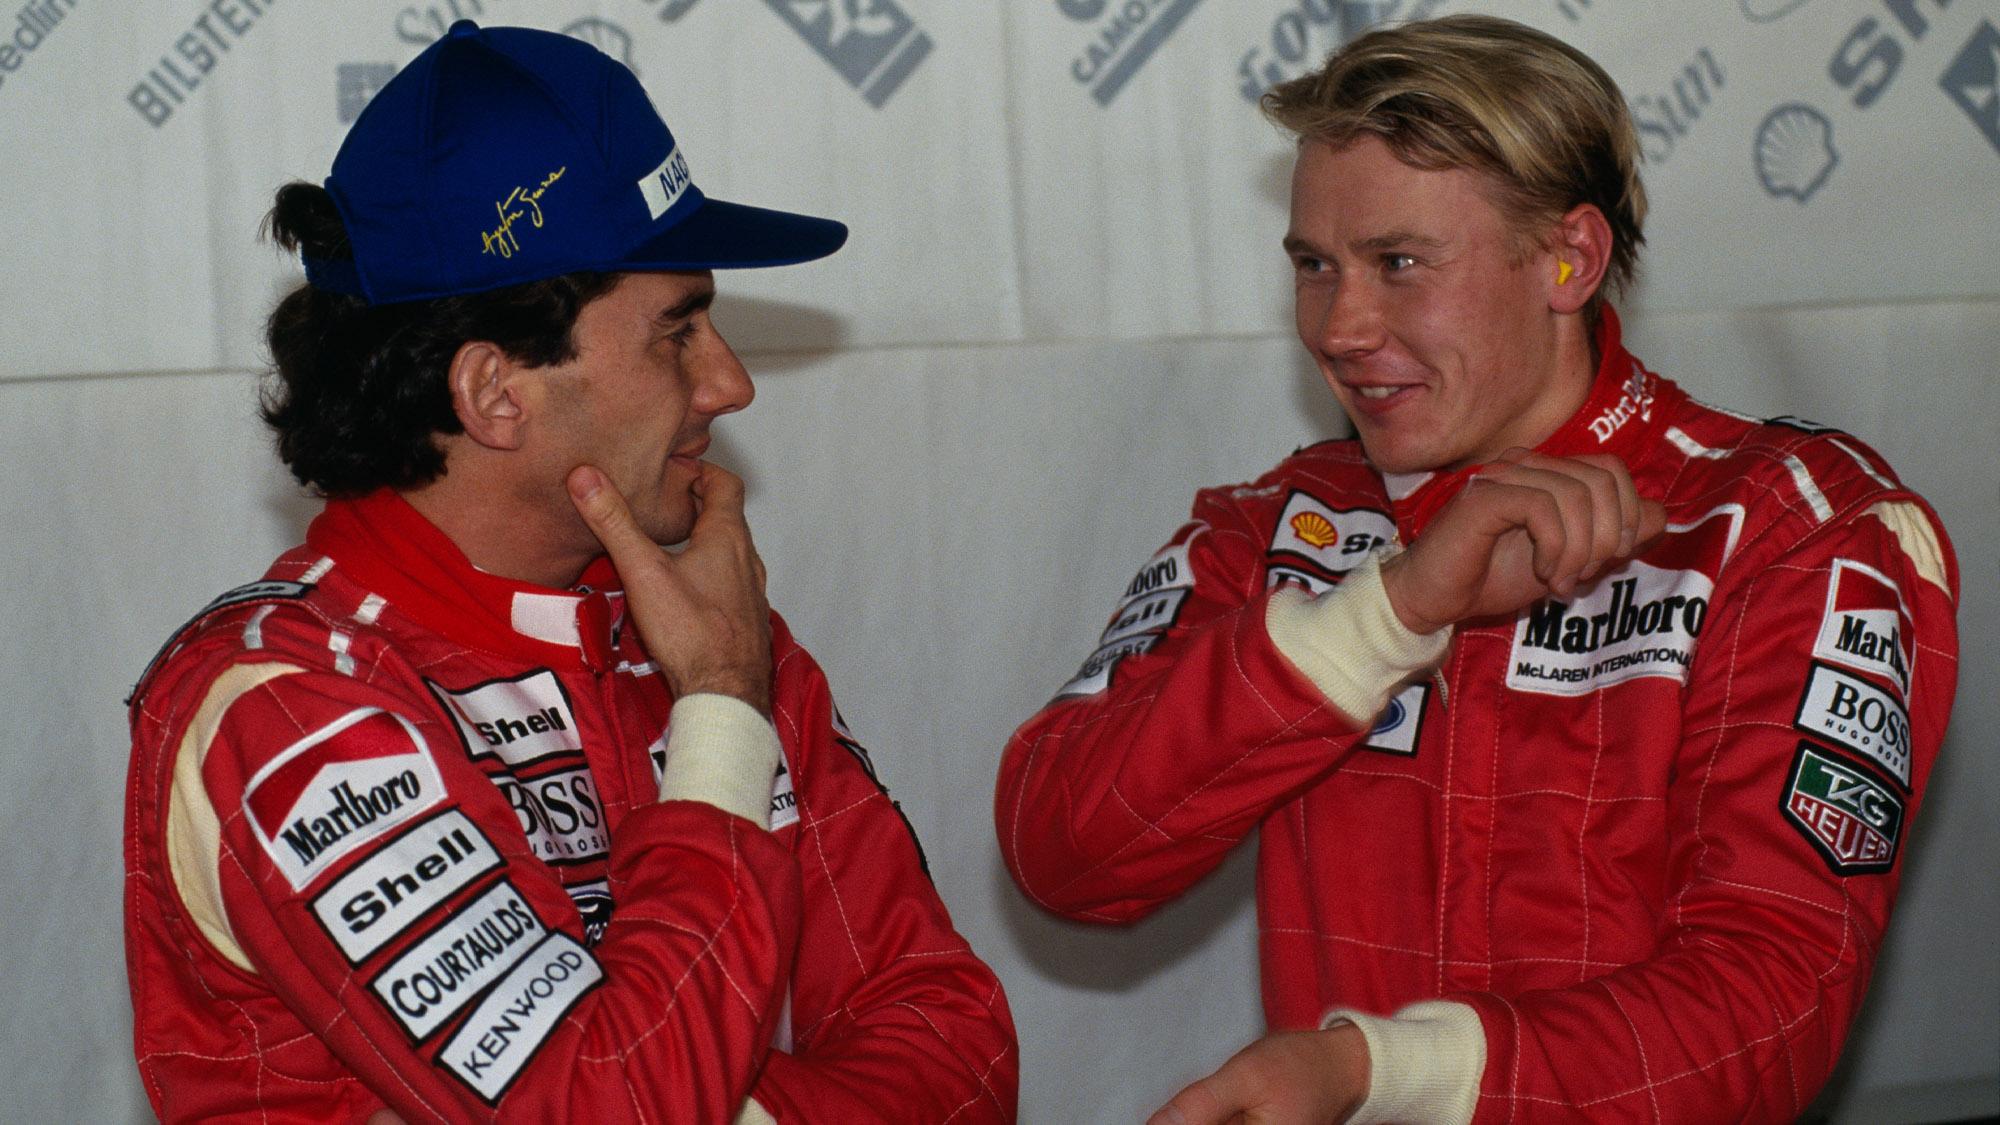 McLaren team-mates Mika Hakkinen and Ayrton Senna